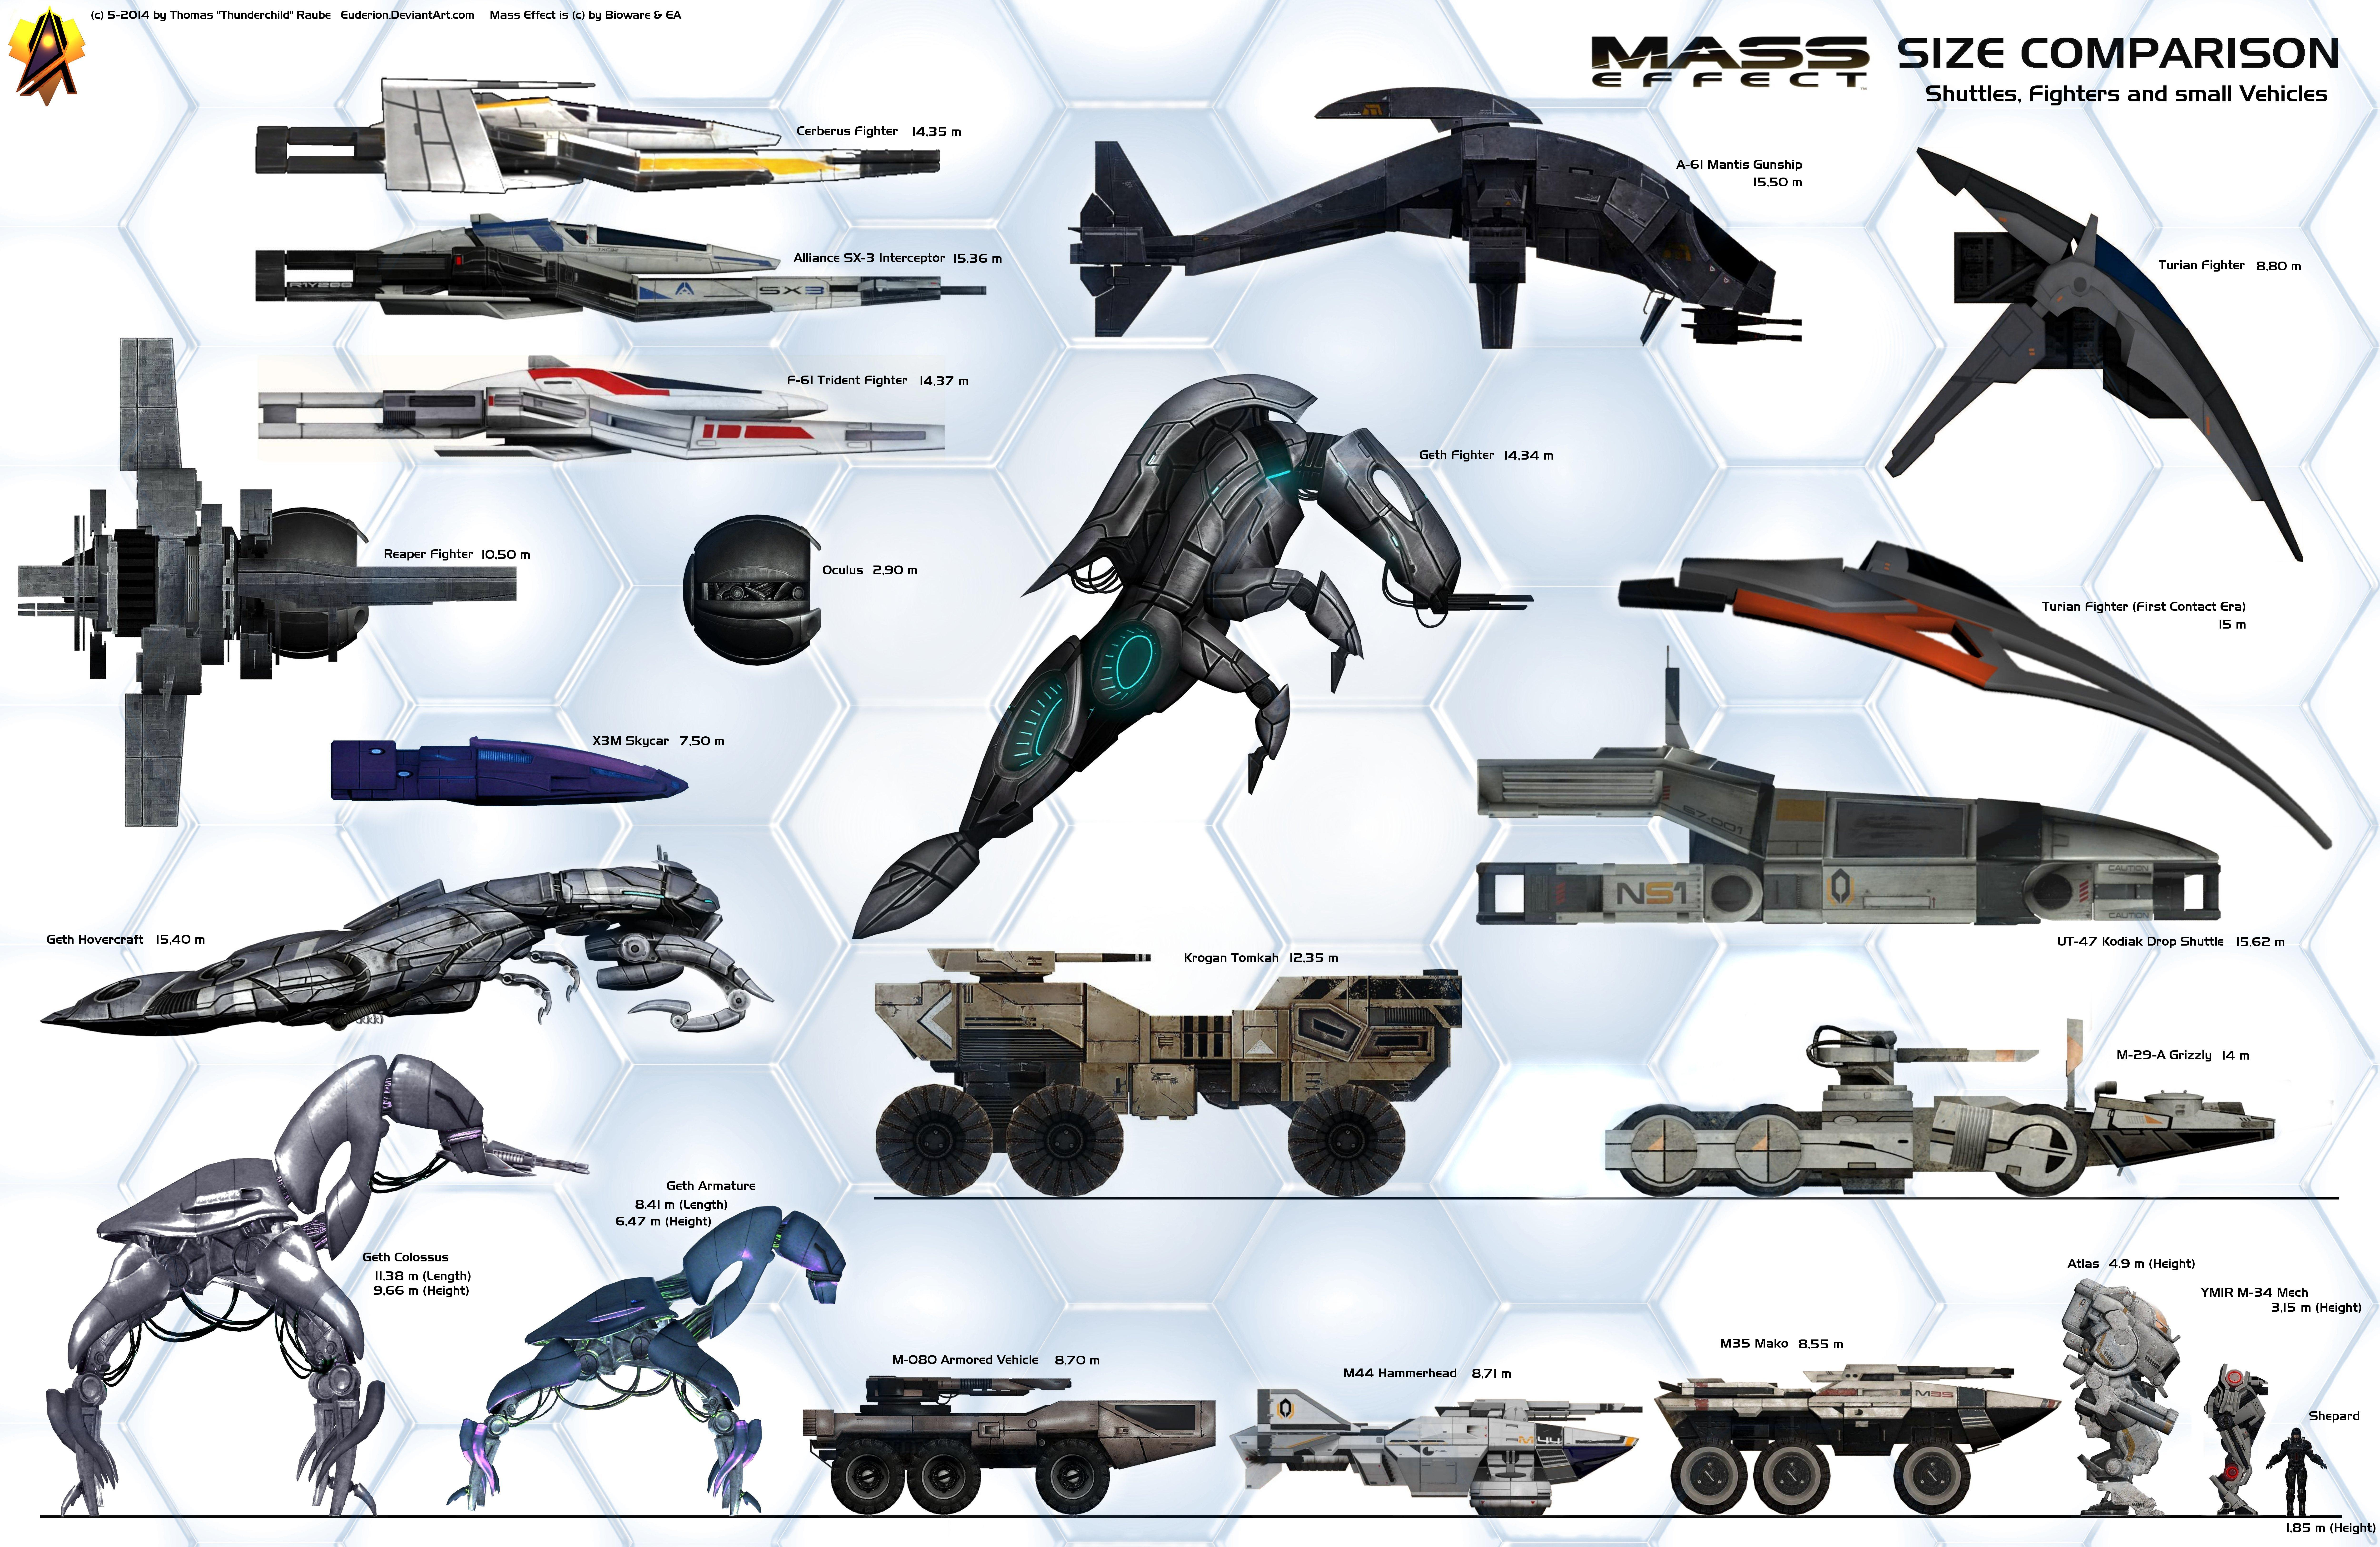 http://fc03.deviantart.net/fs70/f/2014/136/5/5/mass_effect_small_vehicles_size_comparison_by_euderion-d7ilxrj.jpg